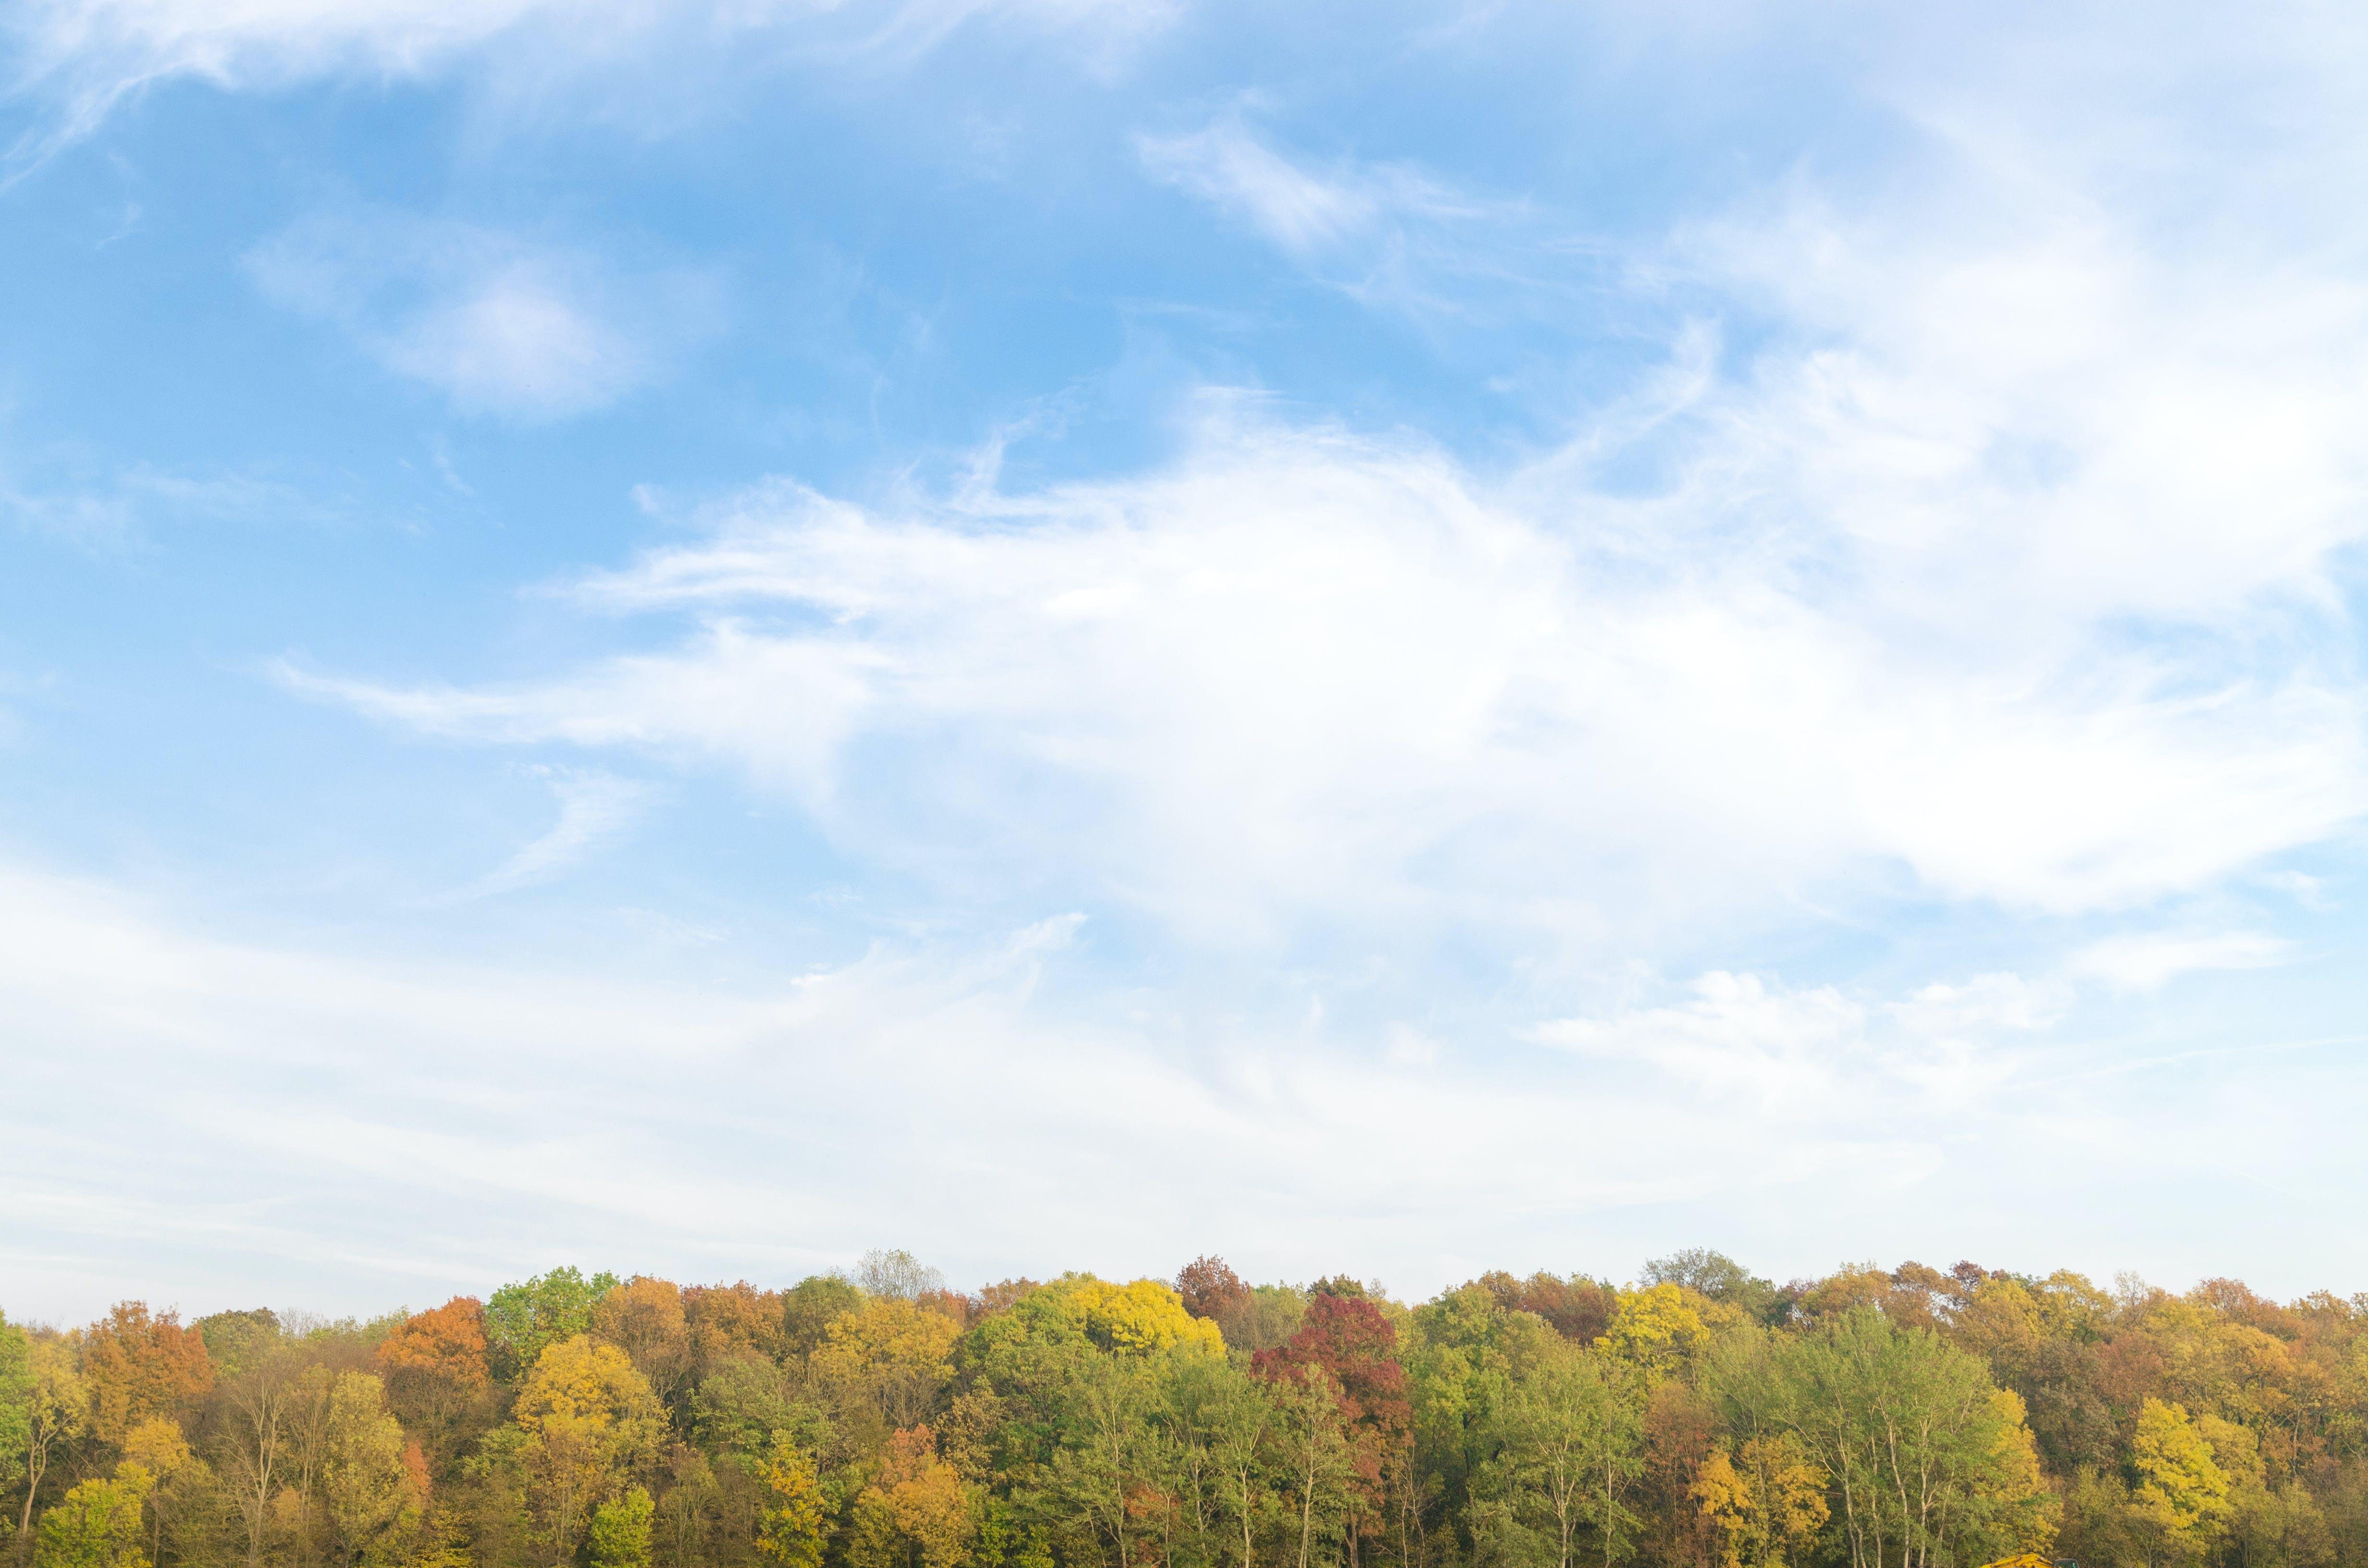 autumn, background, beautiful